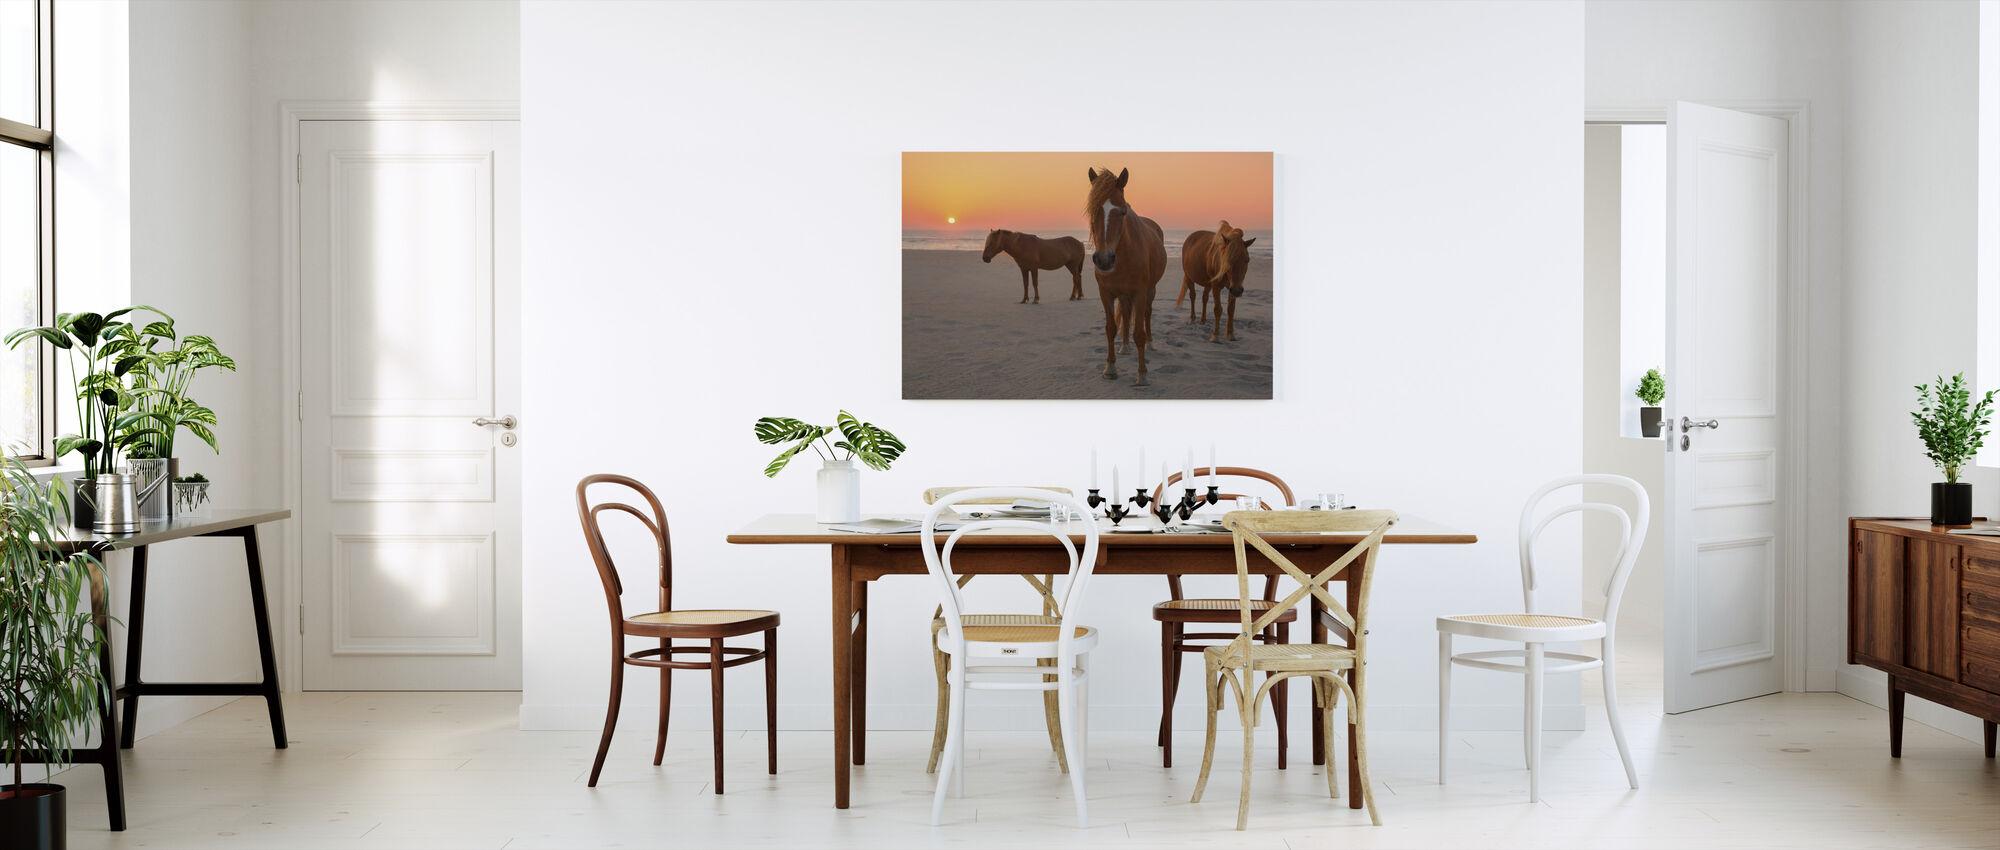 Chestnut Horses on Sunset Beach - Canvas print - Kitchen